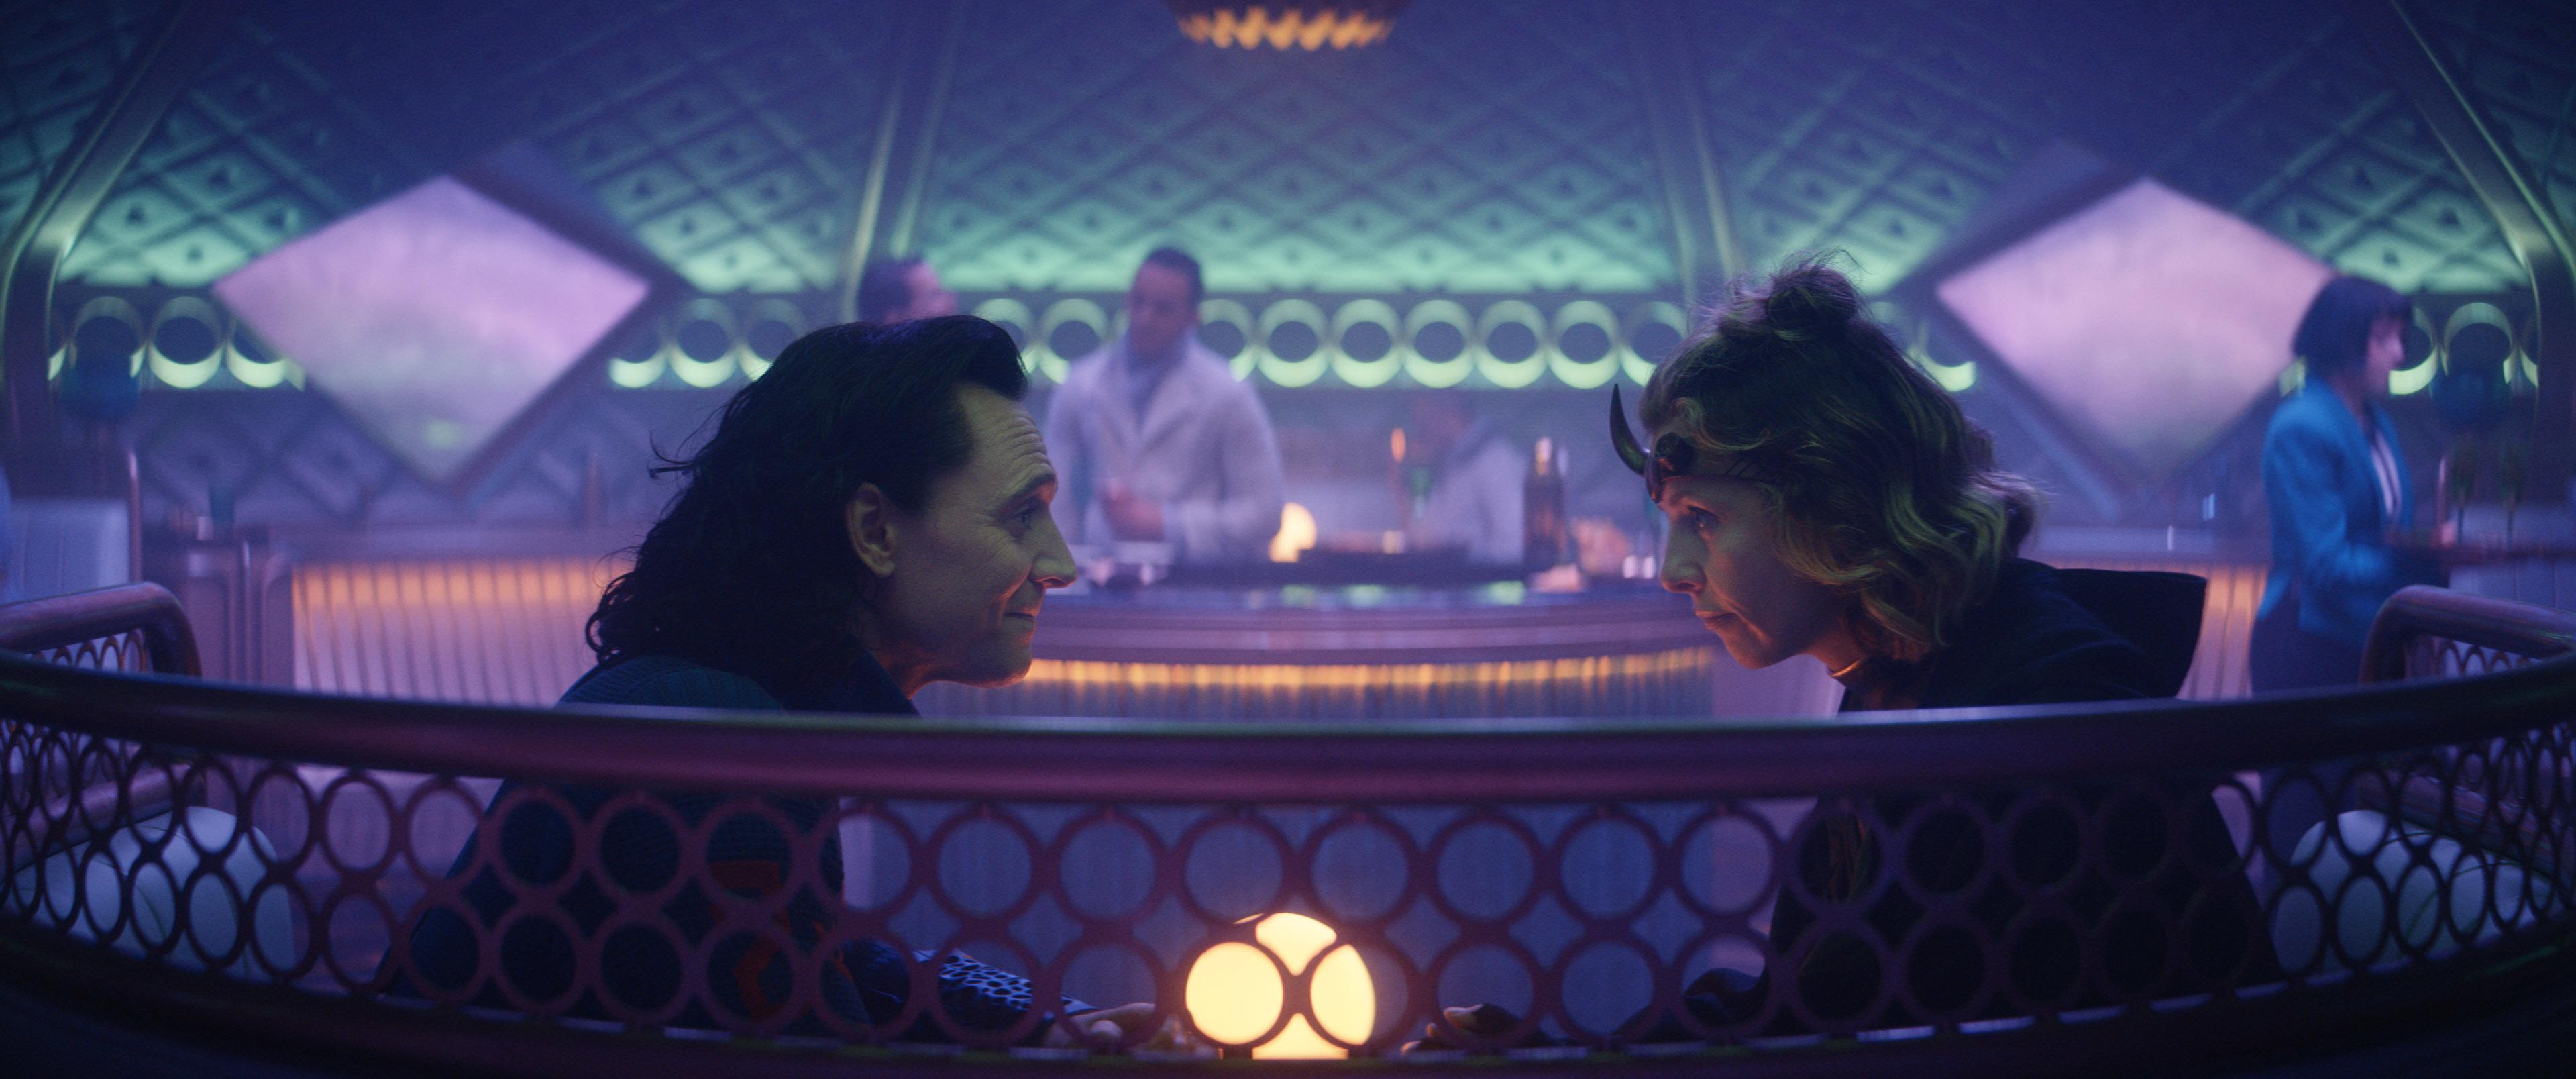 Tom Hiddleston as Loki and Sophia Di Martino as Sylvie in Loki